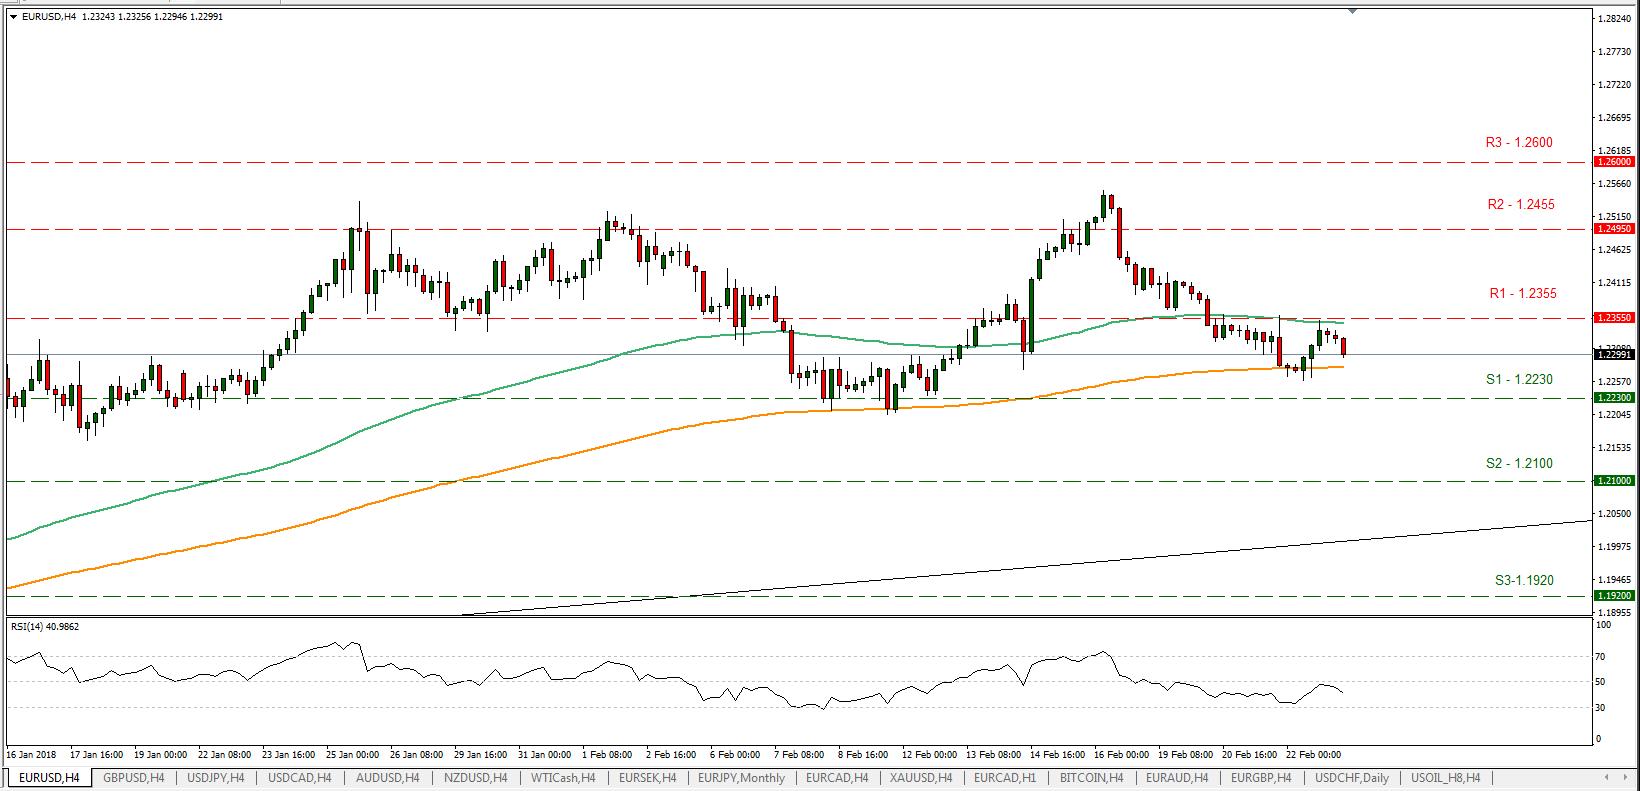 EUR/USD 23/02/2018 | EconAlerts